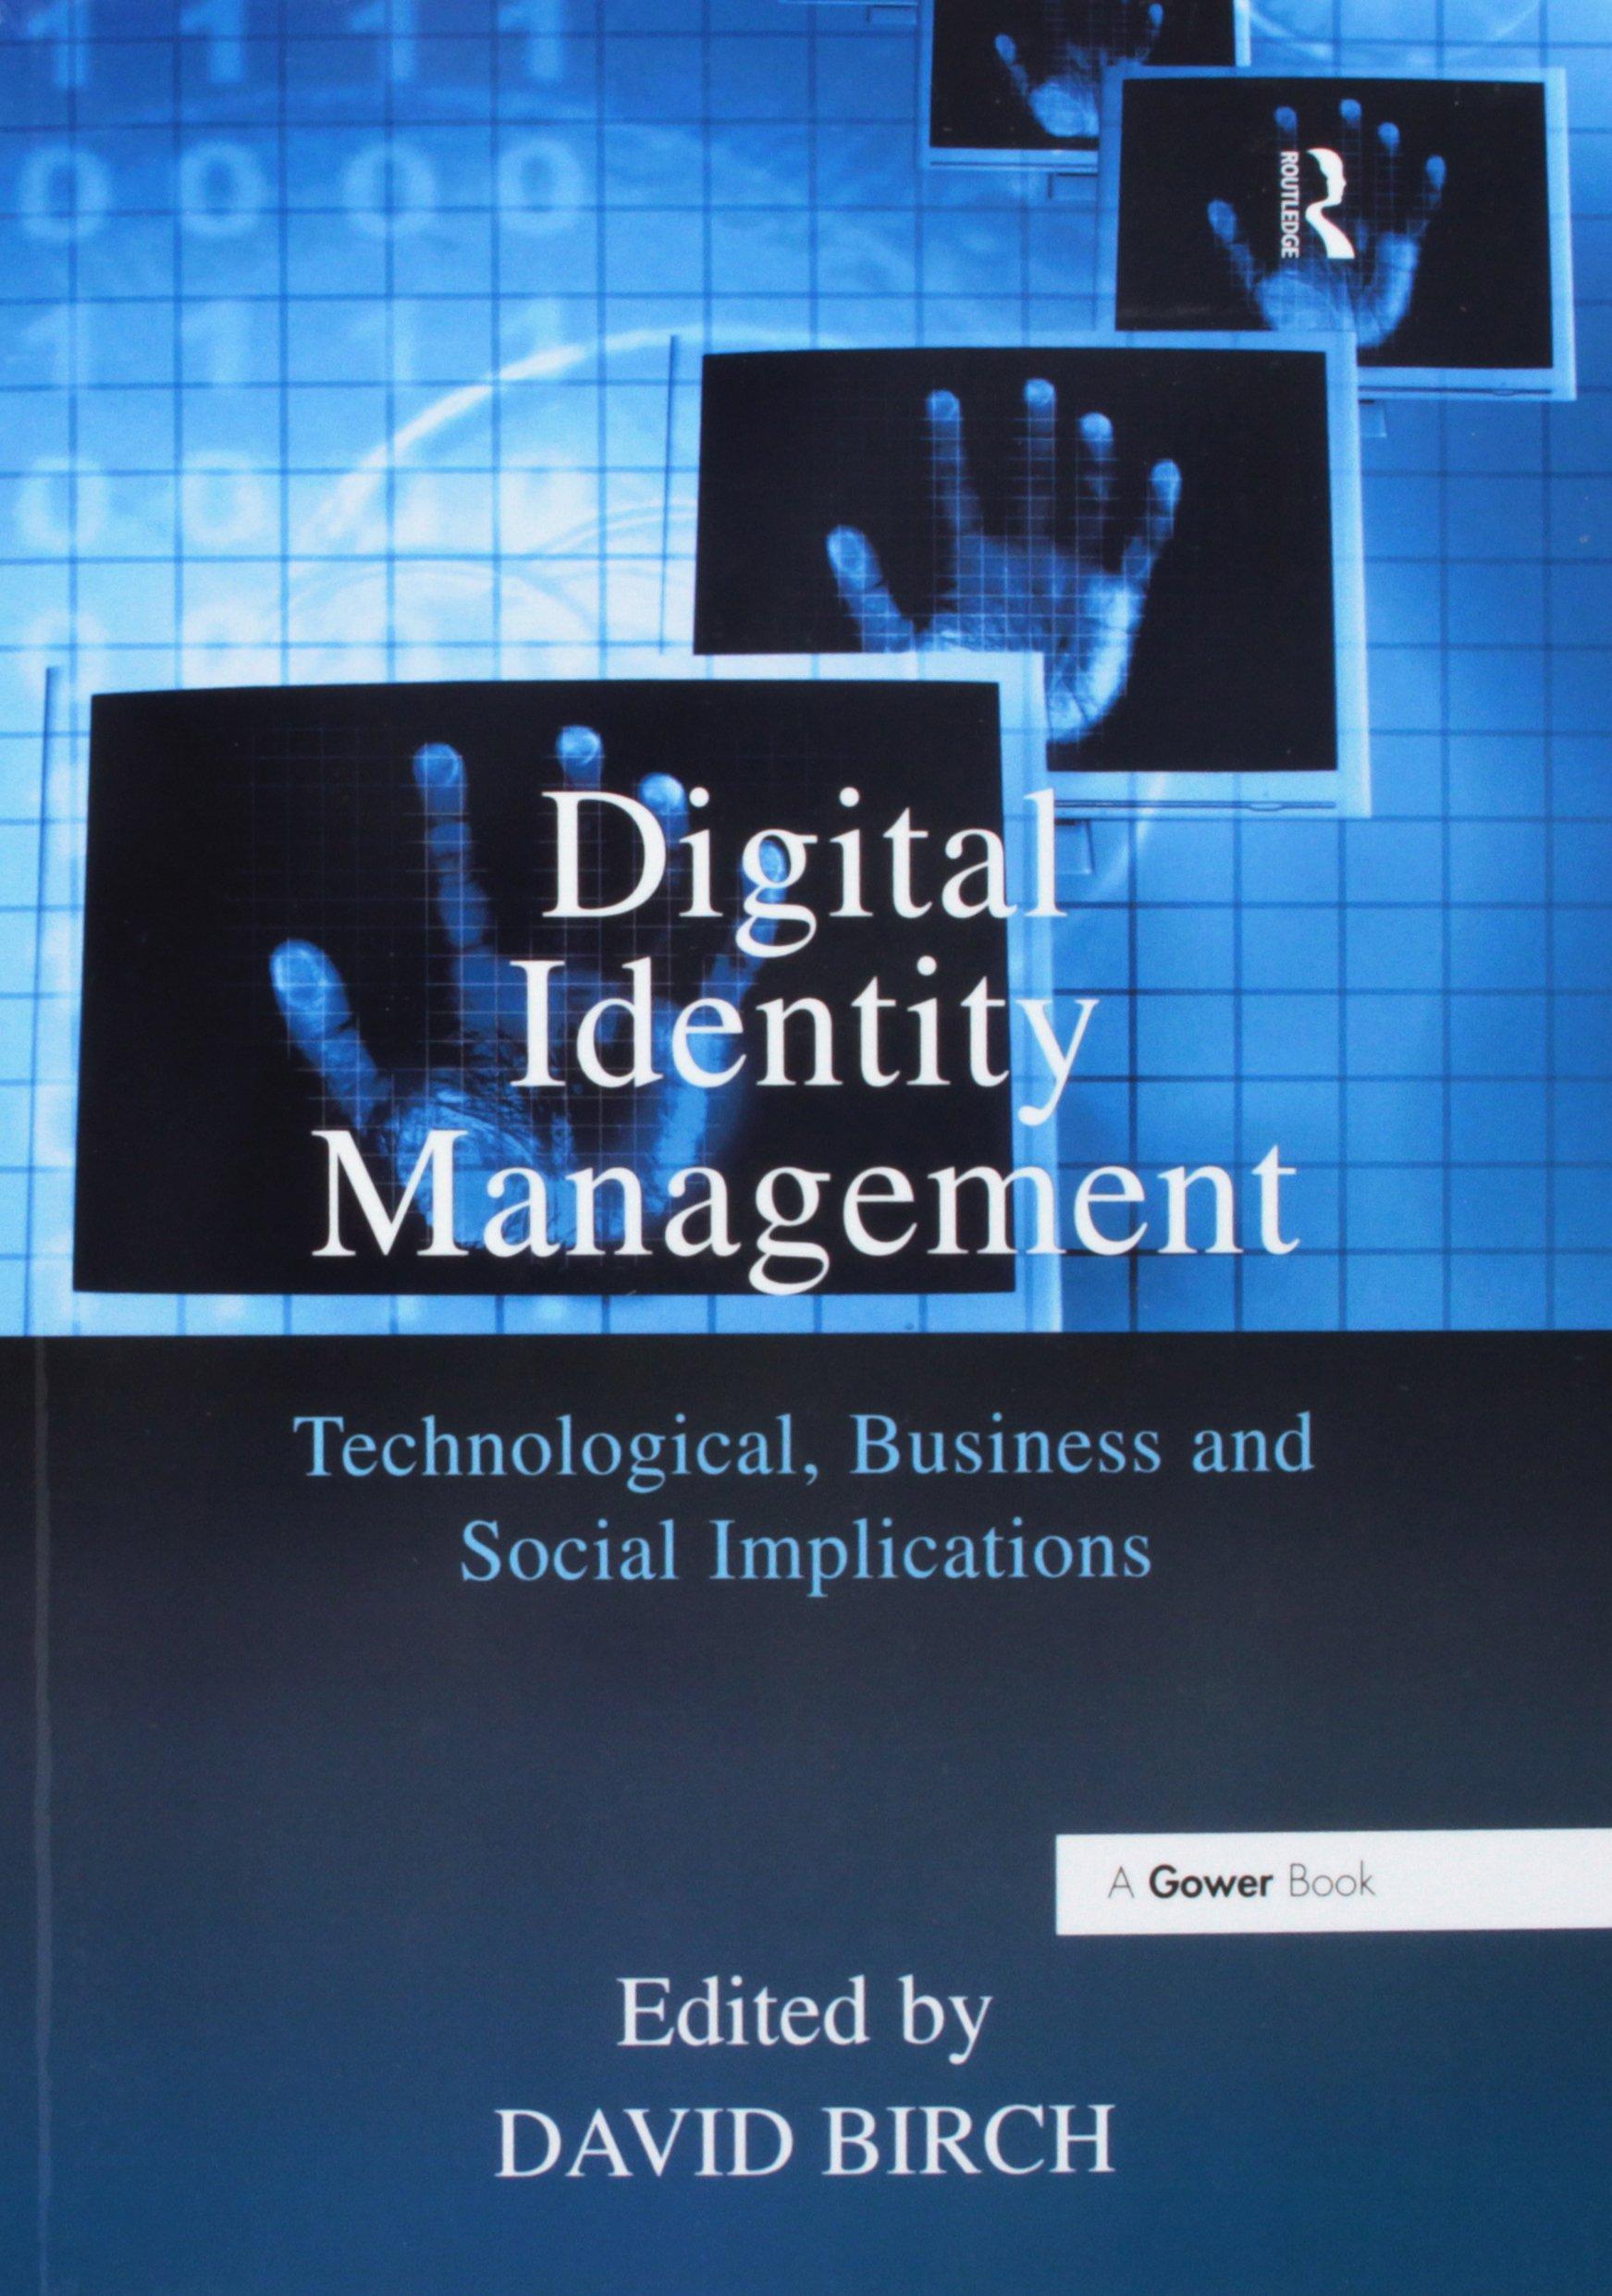 Digital Identity Management por David Birch